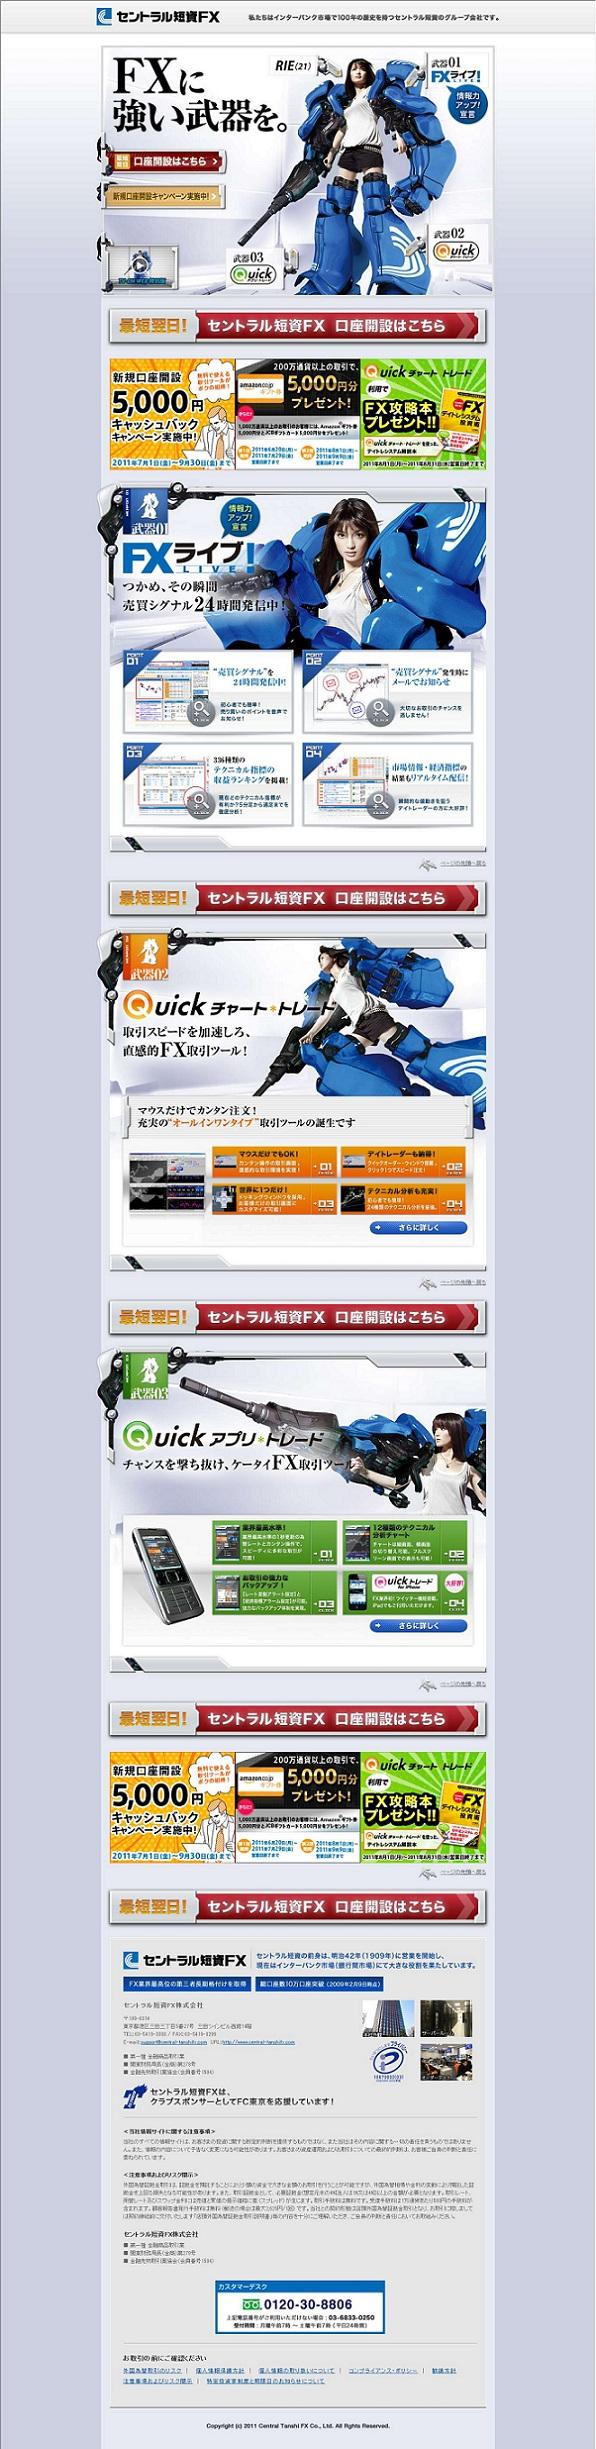 WebCap20110825-214904.jpg